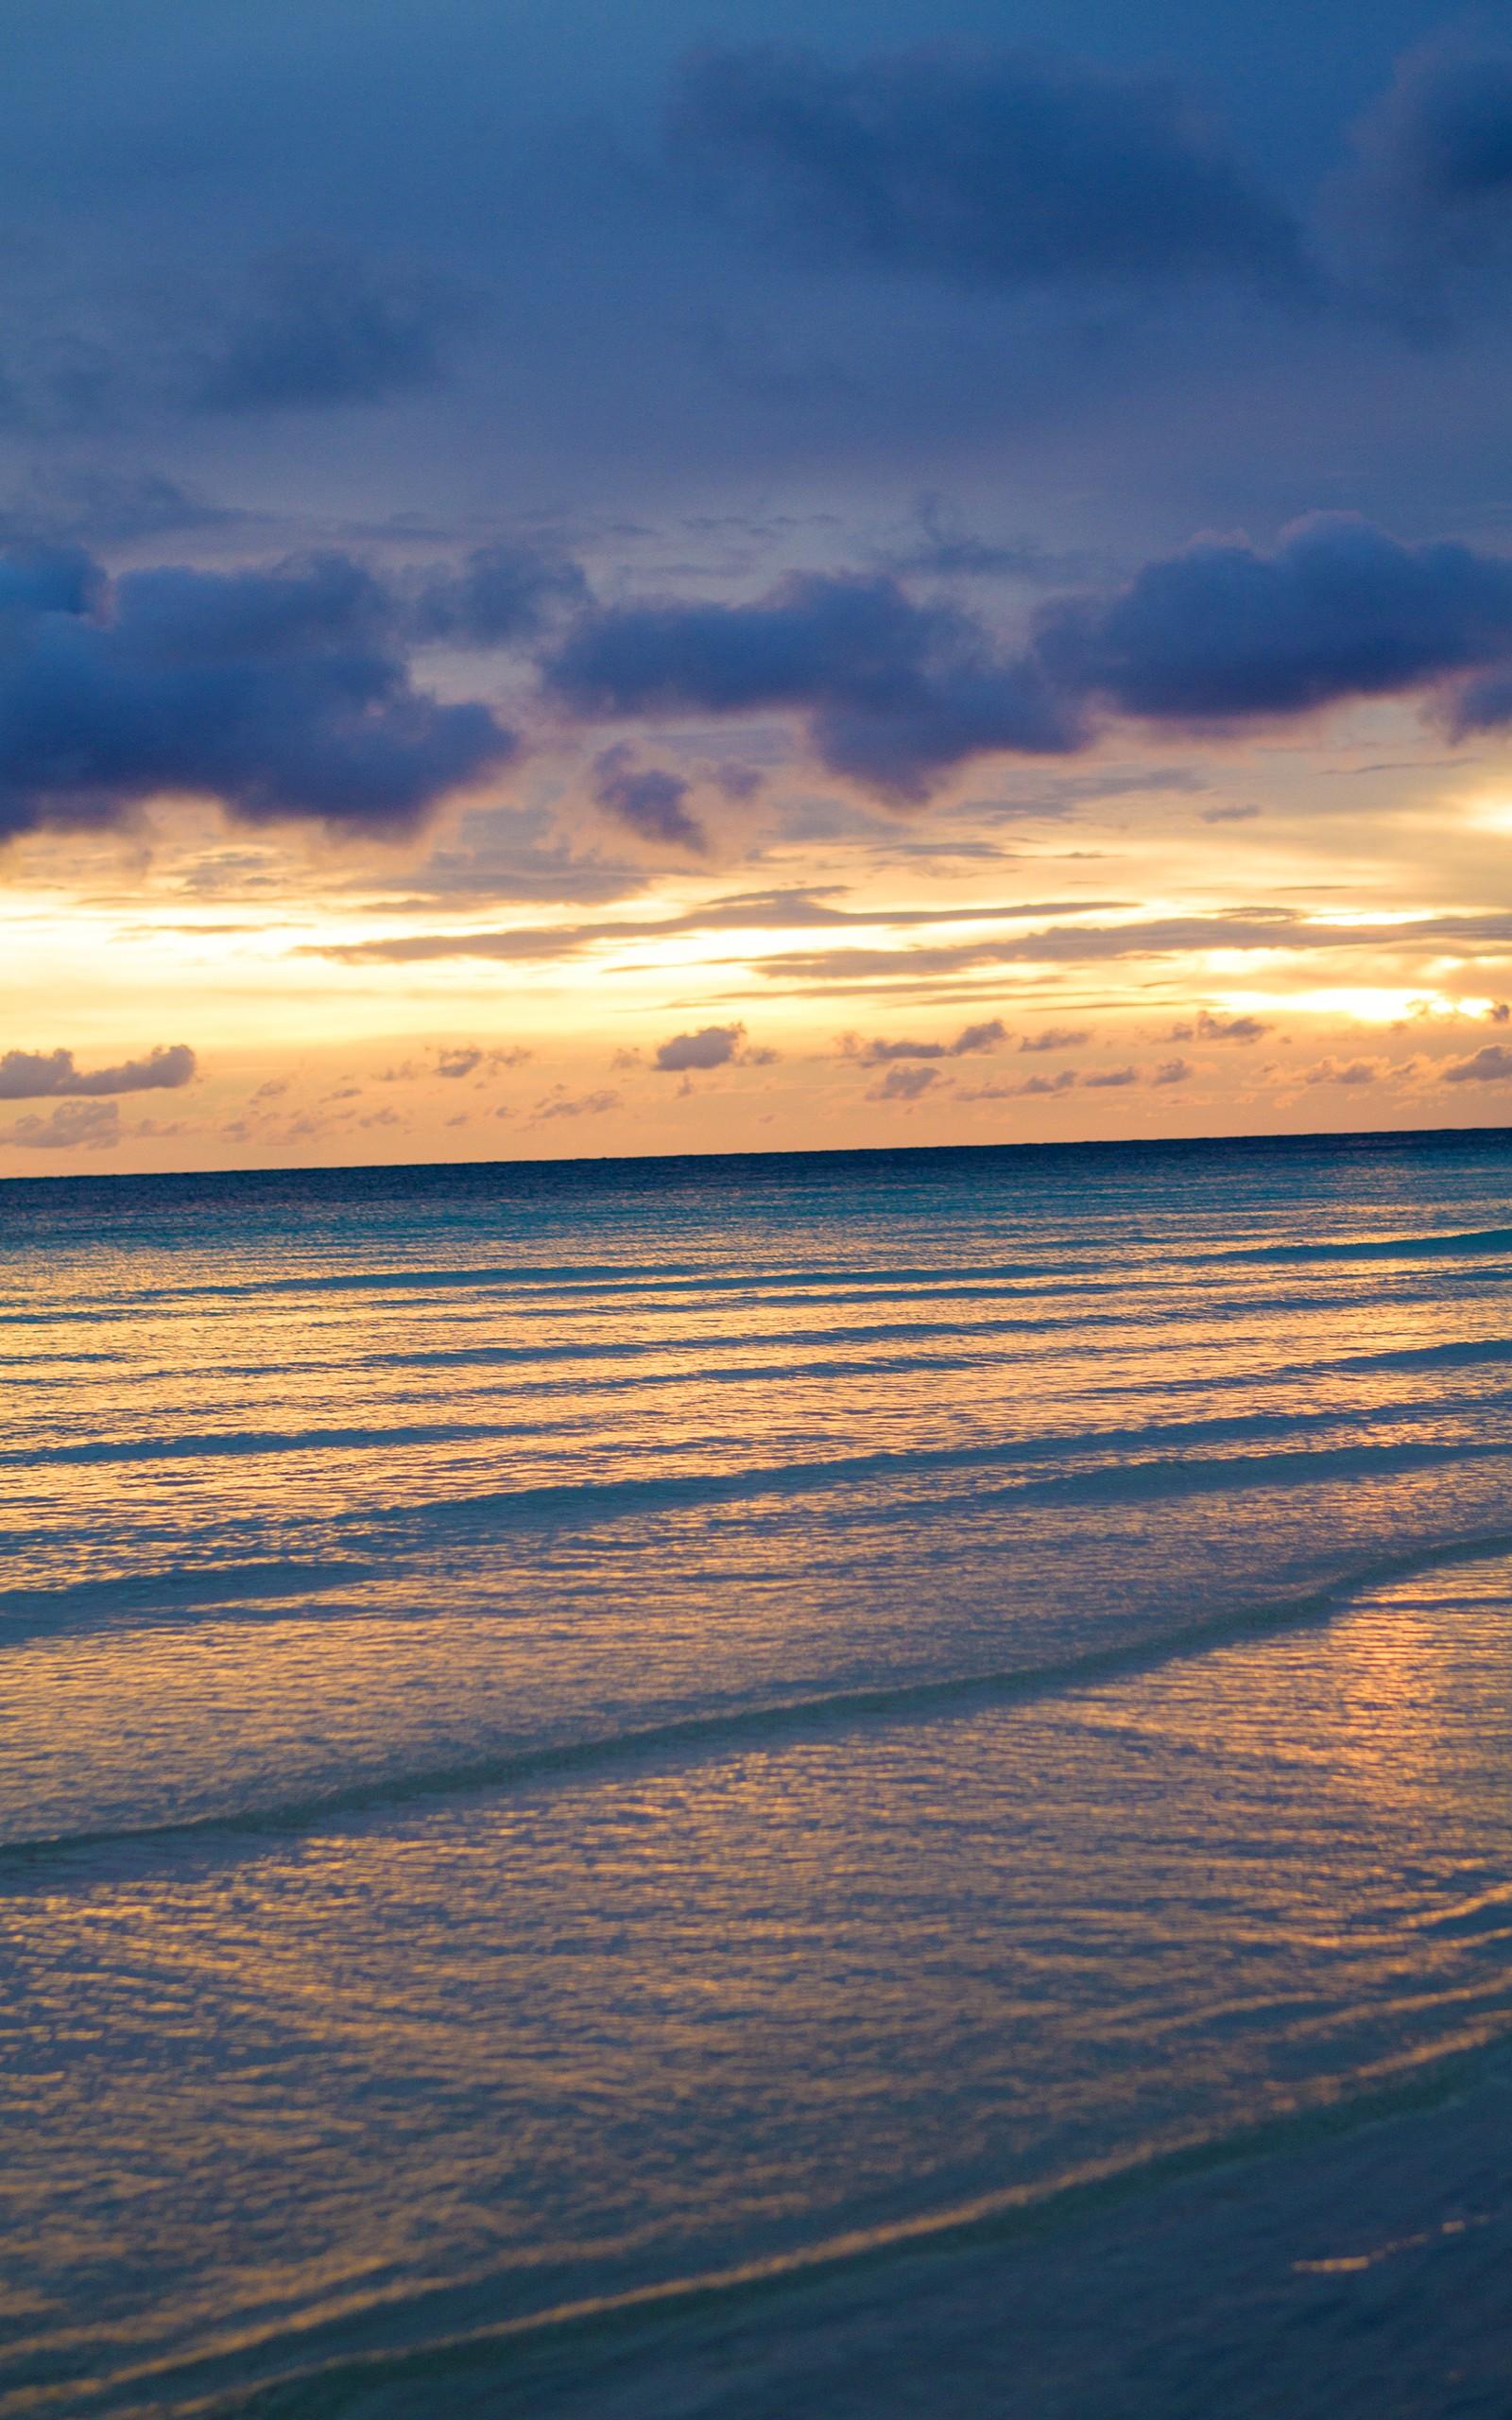 Wallpaper : sunlight, sunset, sea, bay, shore, sand